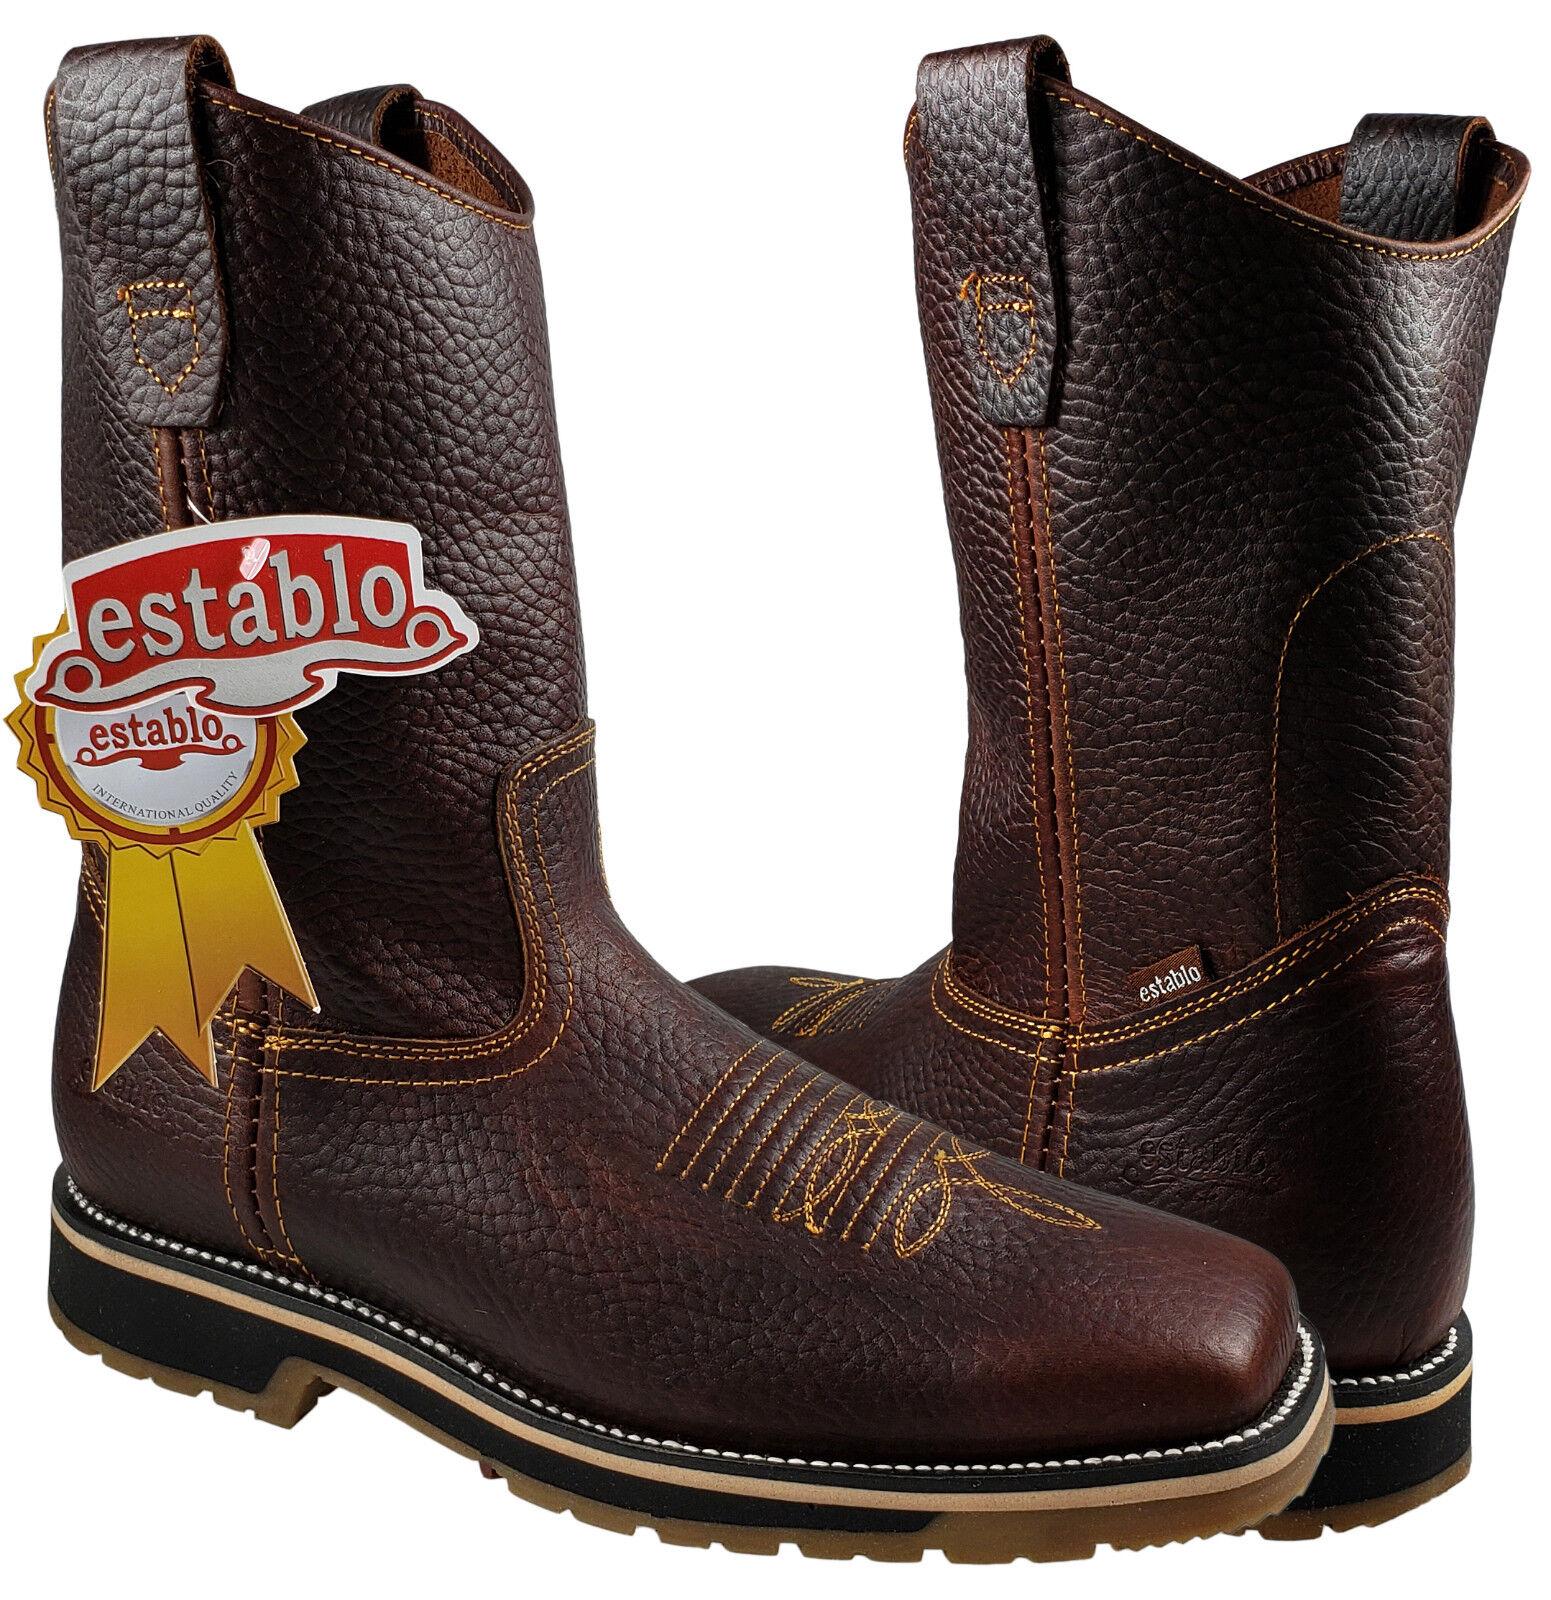 Men's Work Rodeo Boots Establo Genuine Leather color Brown Bull Fight